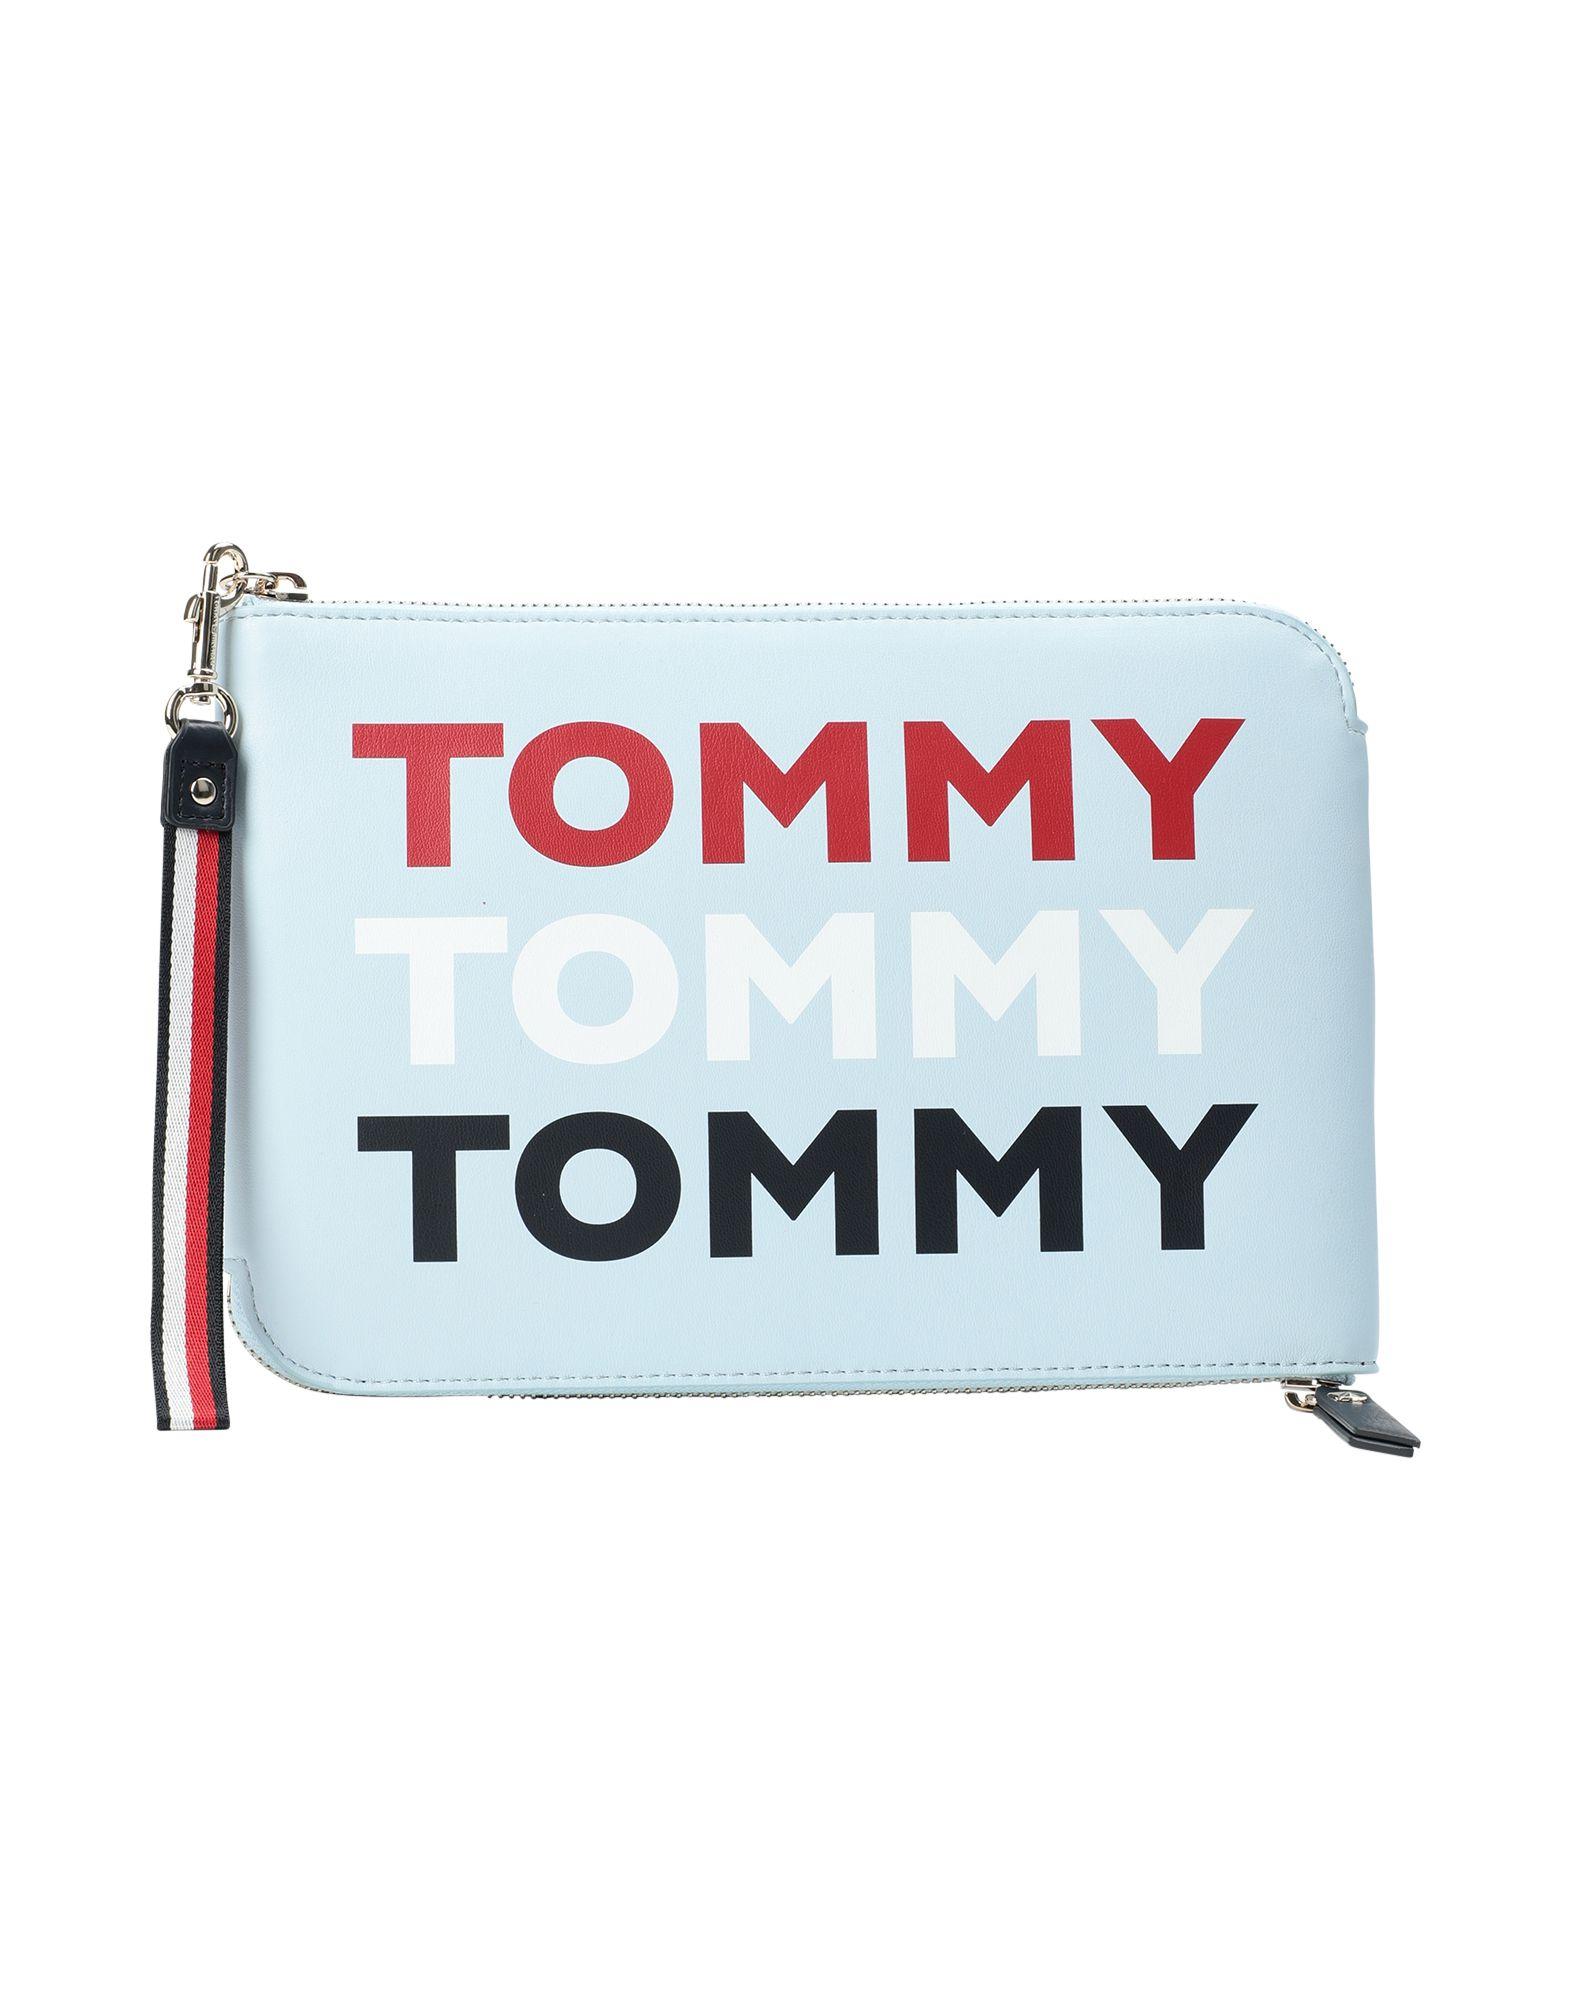 TOMMY HILFIGER Сумка на руку tommy hilfiger сумка на руку